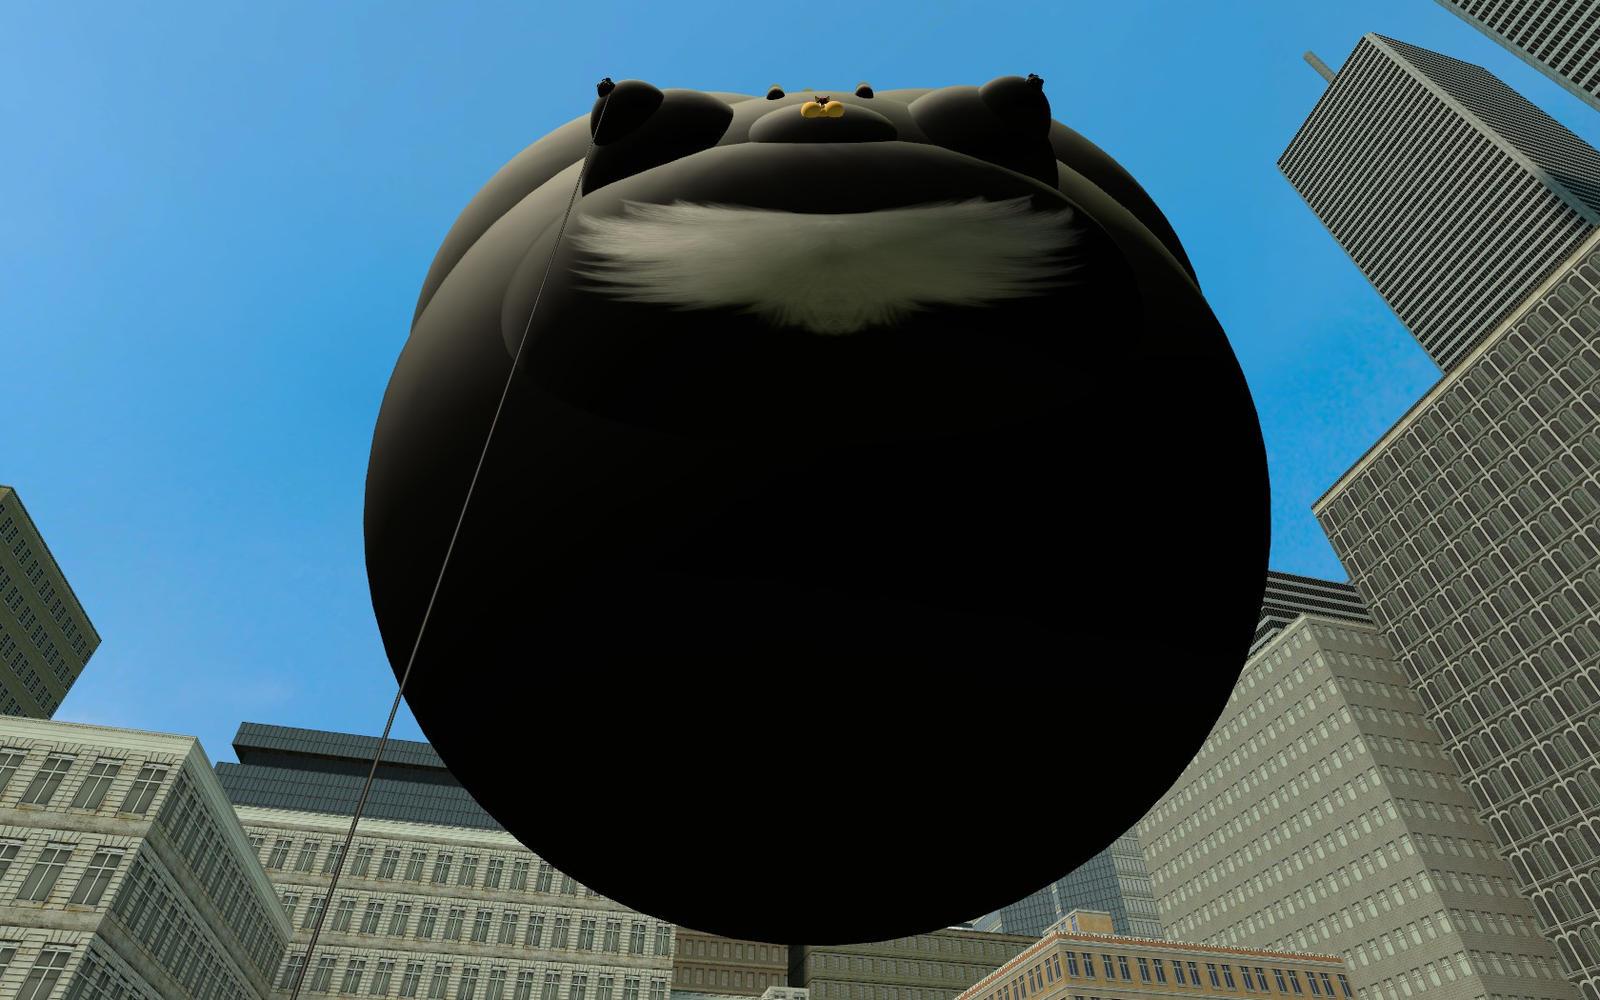 Shadow Balloon By SRX1995 On DeviantArt